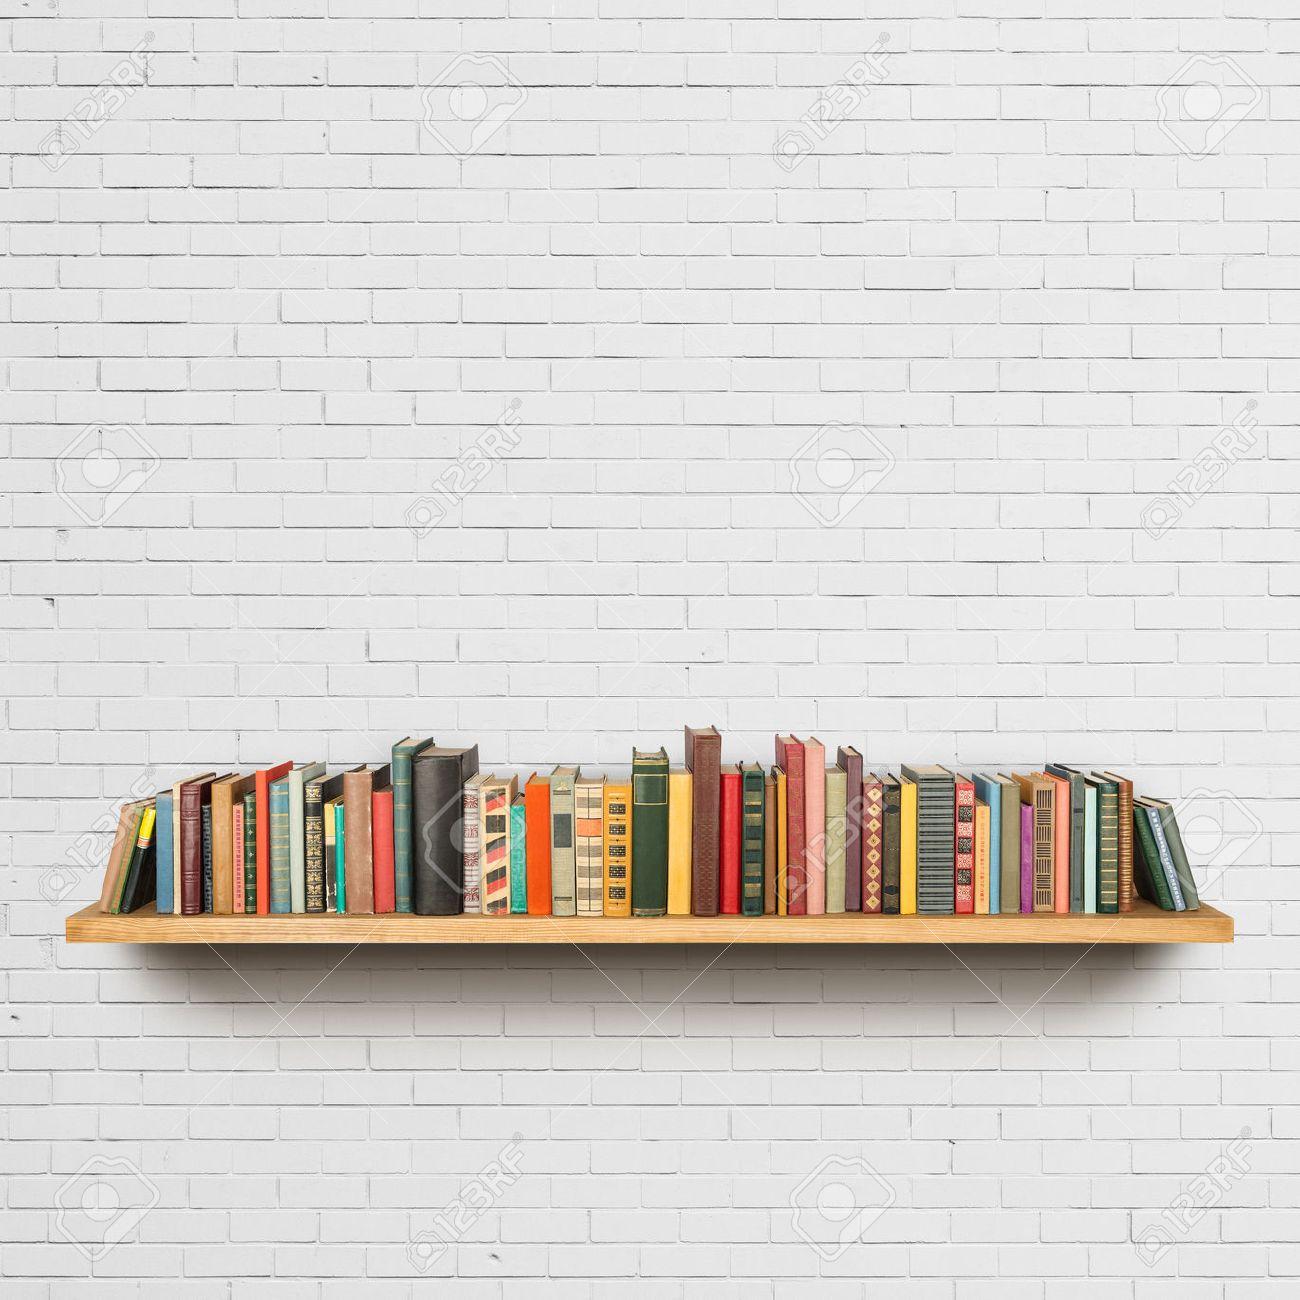 Old books on the shelf Stock Photo - 38641506